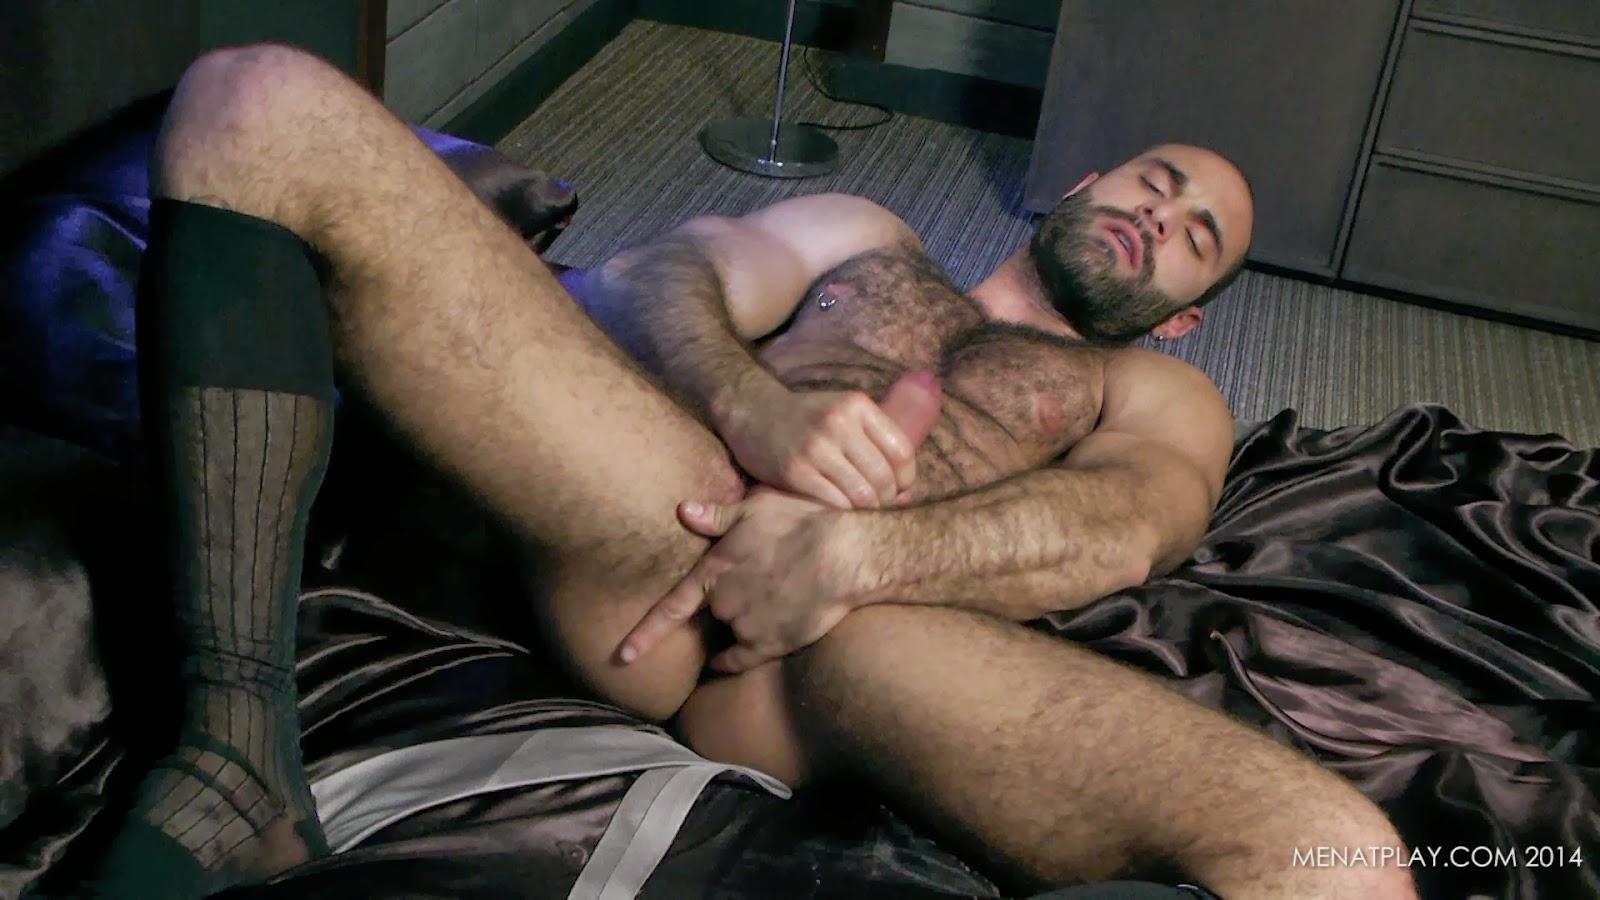 Pornstar muscle man jerks off